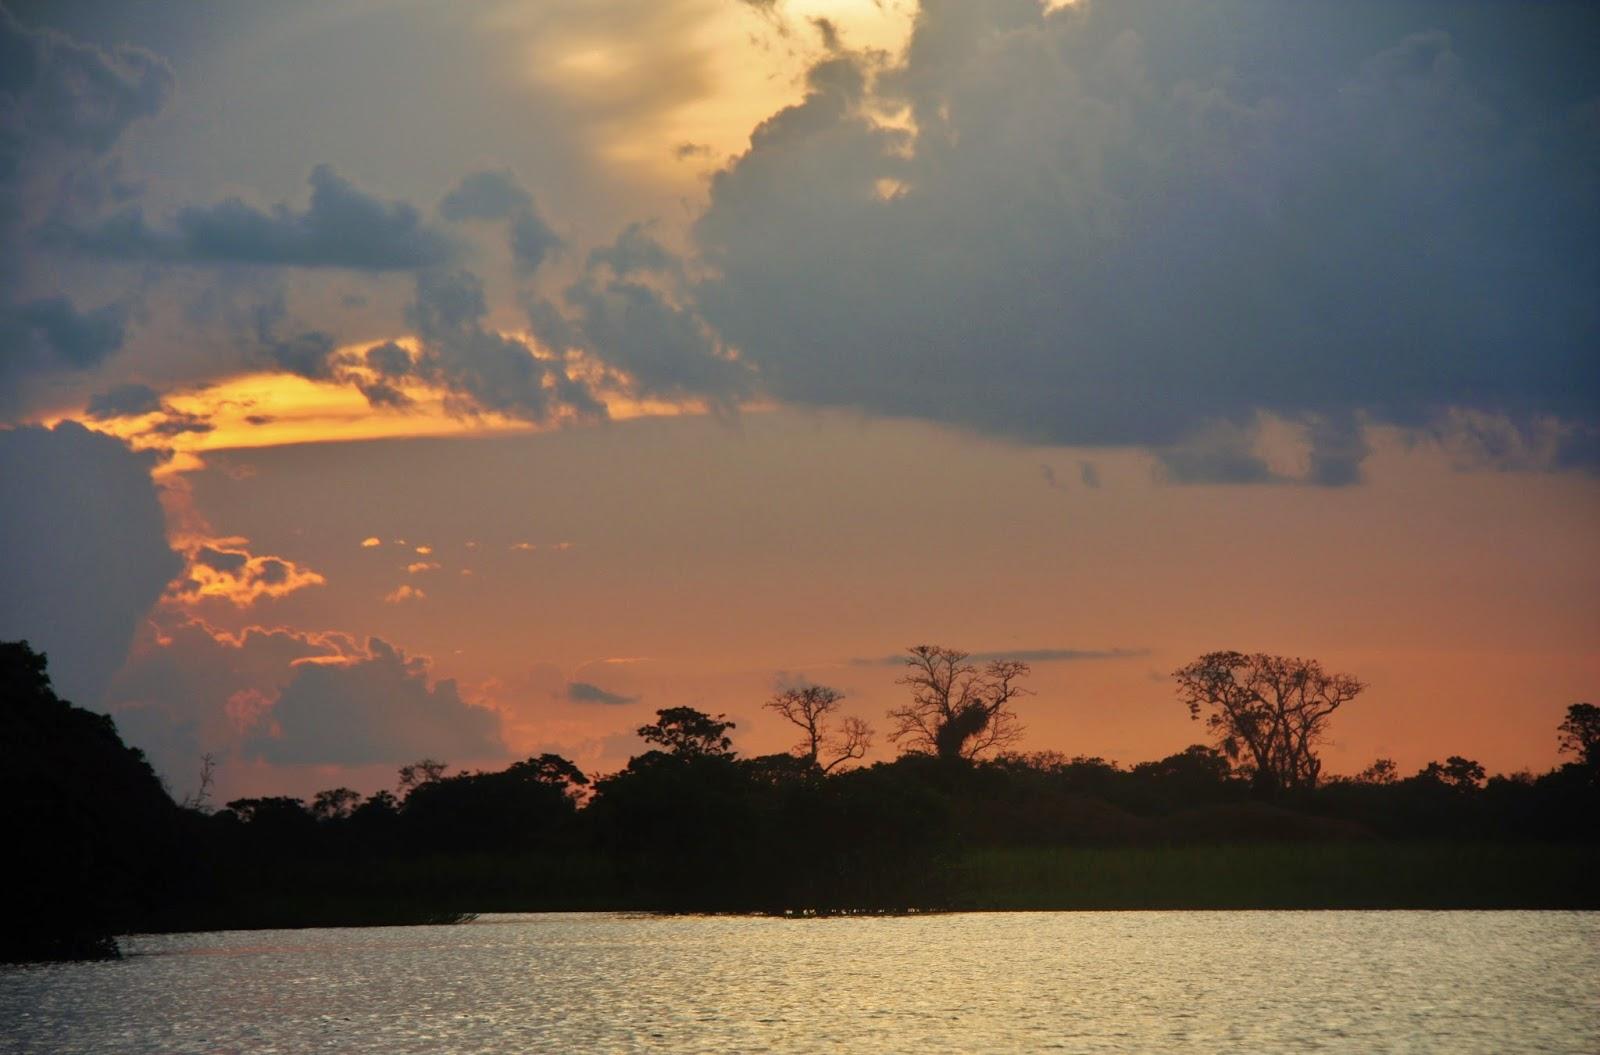 Entardecer na Reserva de Desenvolvimento Sustentável Mamirauá